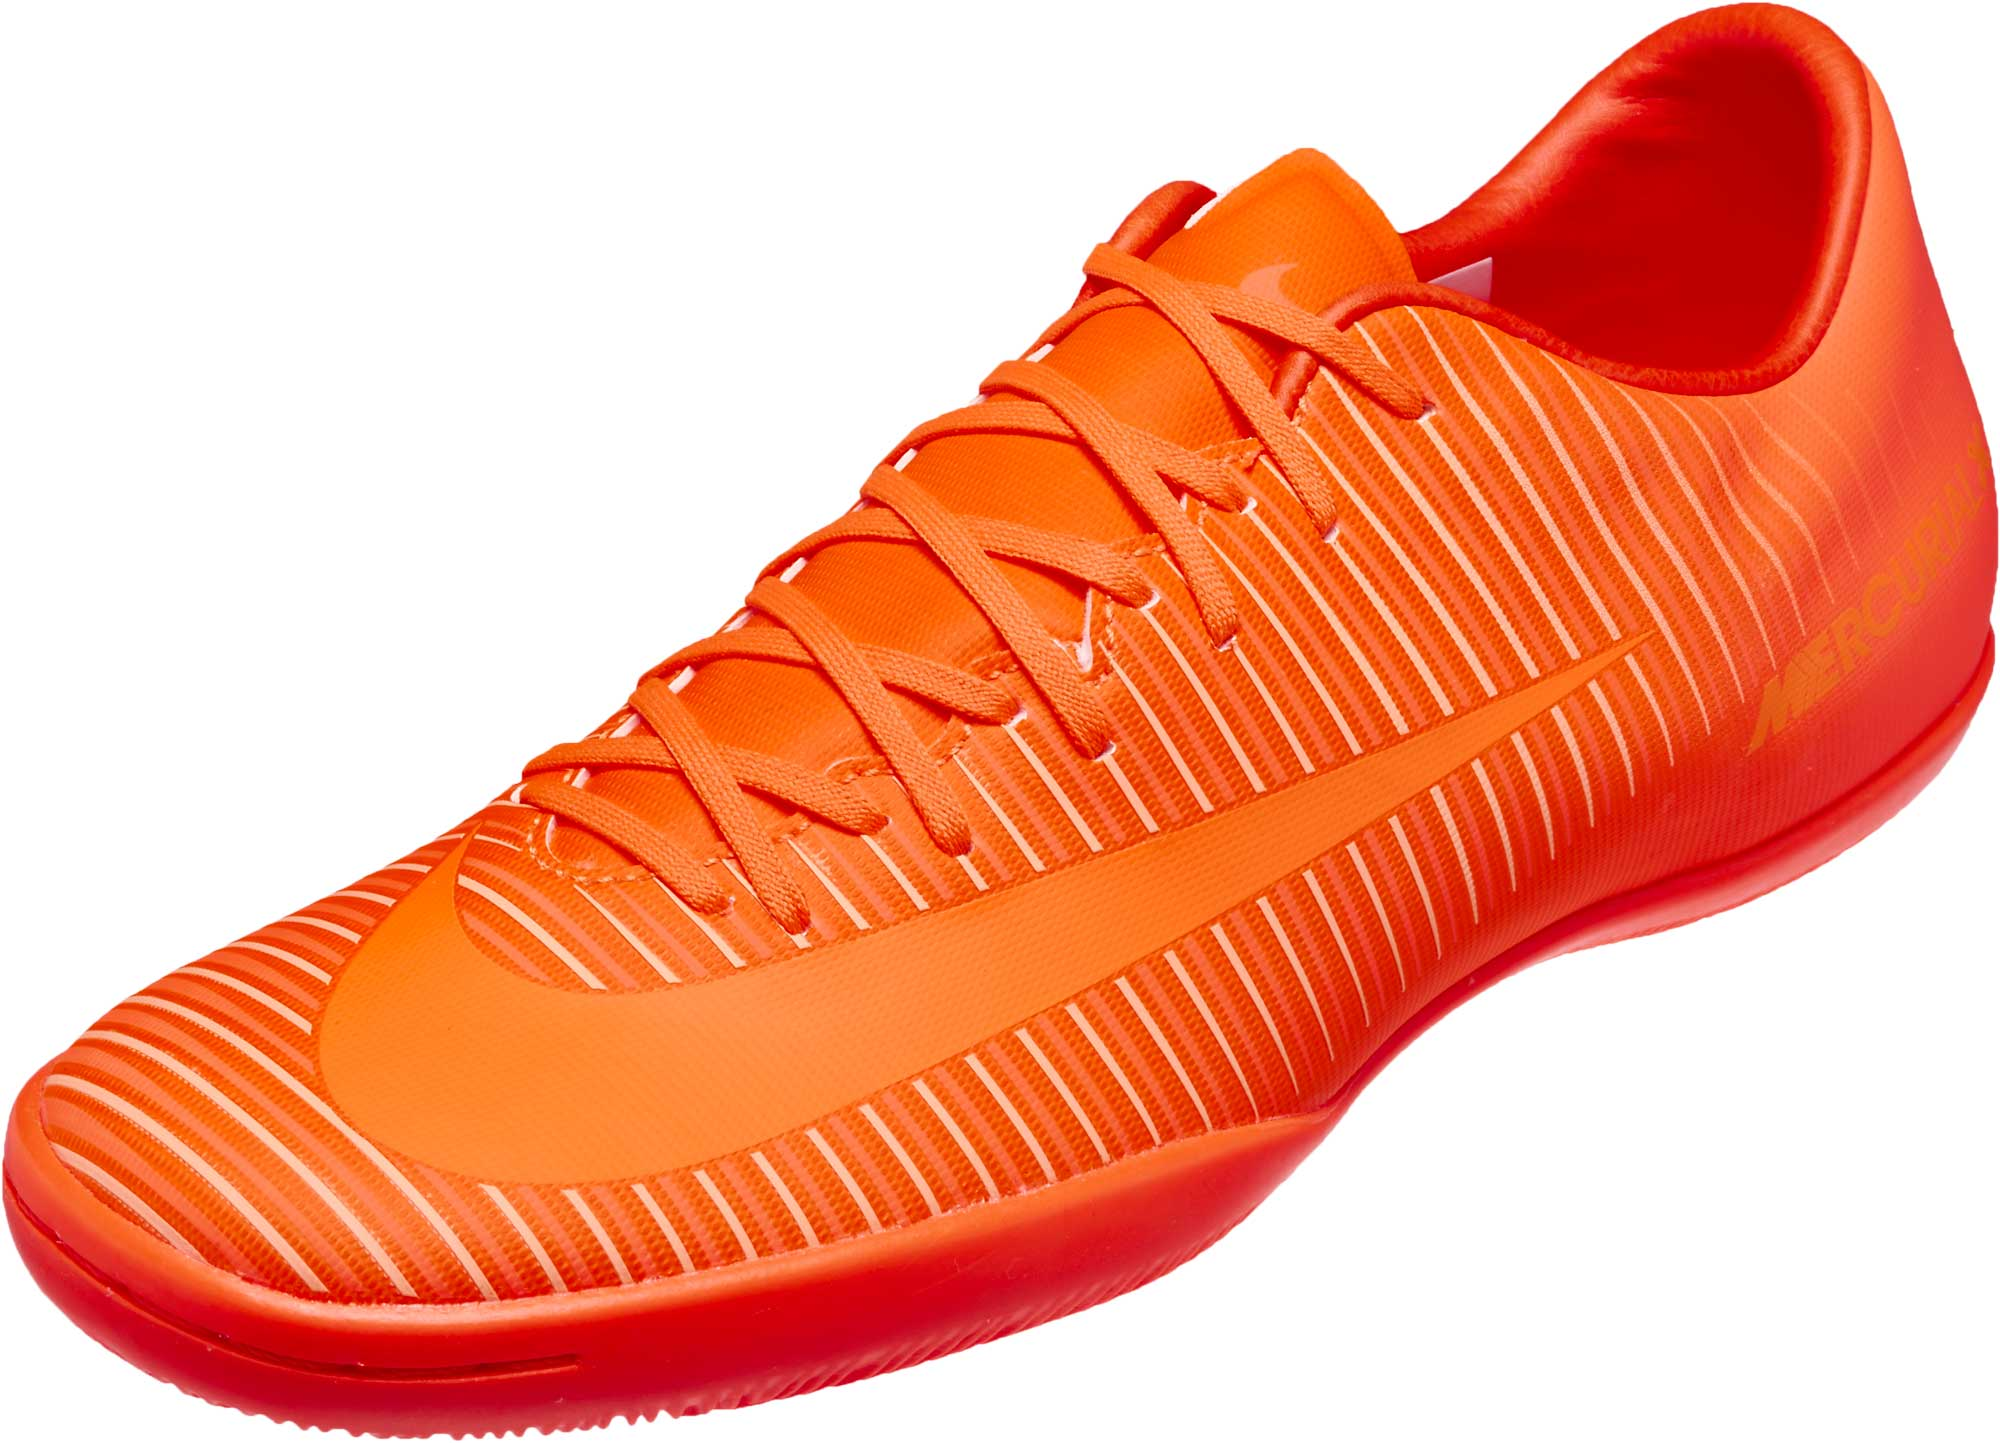 Nike Mercurial Victory VI IC- Orange